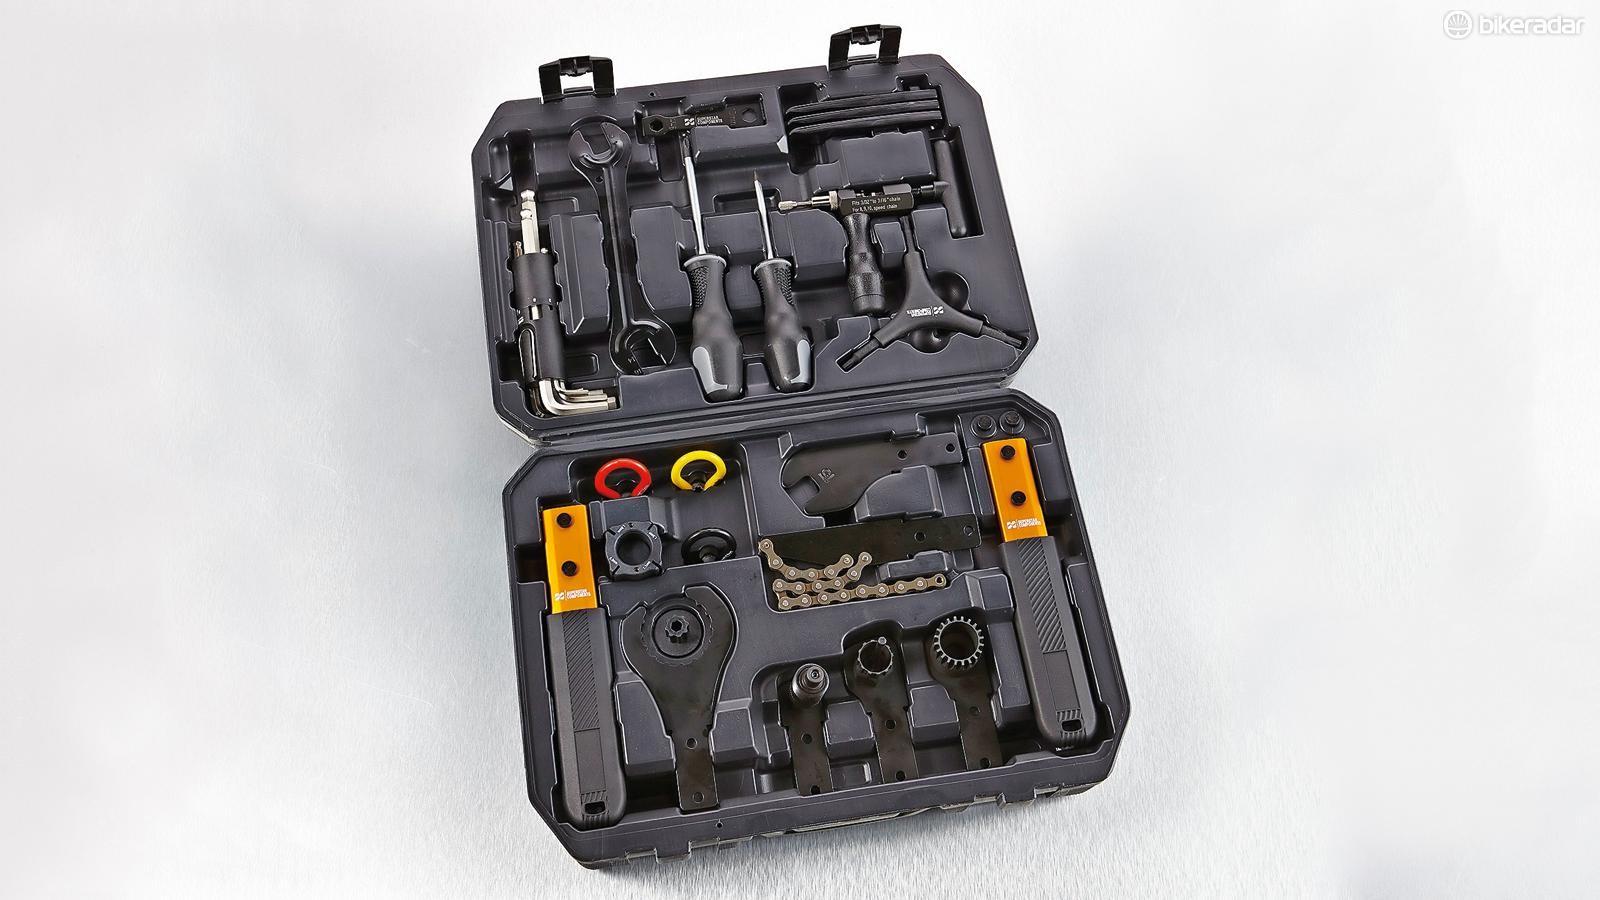 Superstar Proline tool kit